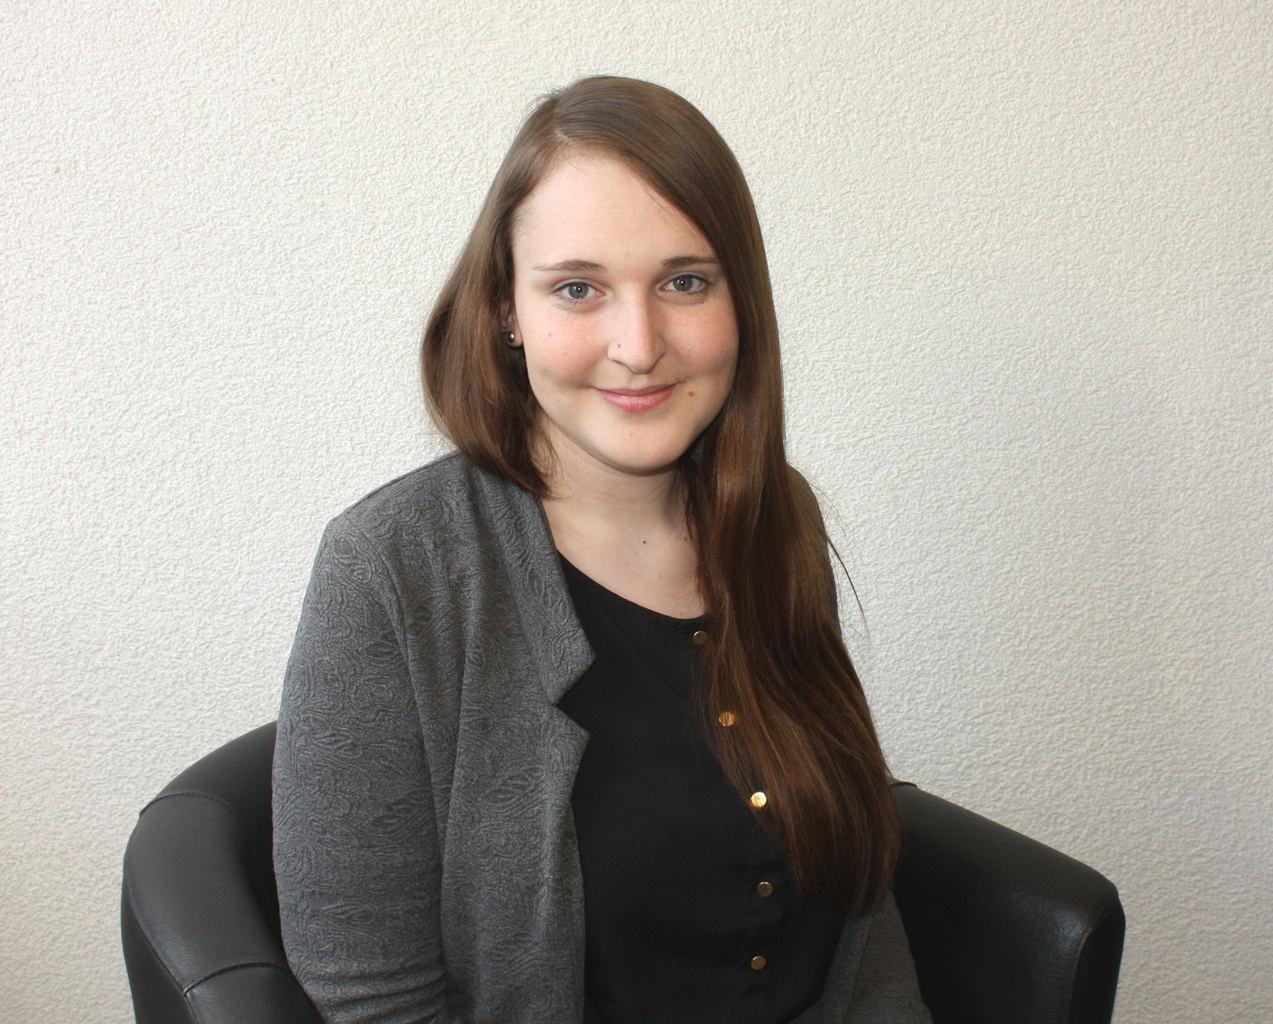 Jacqueline Senn